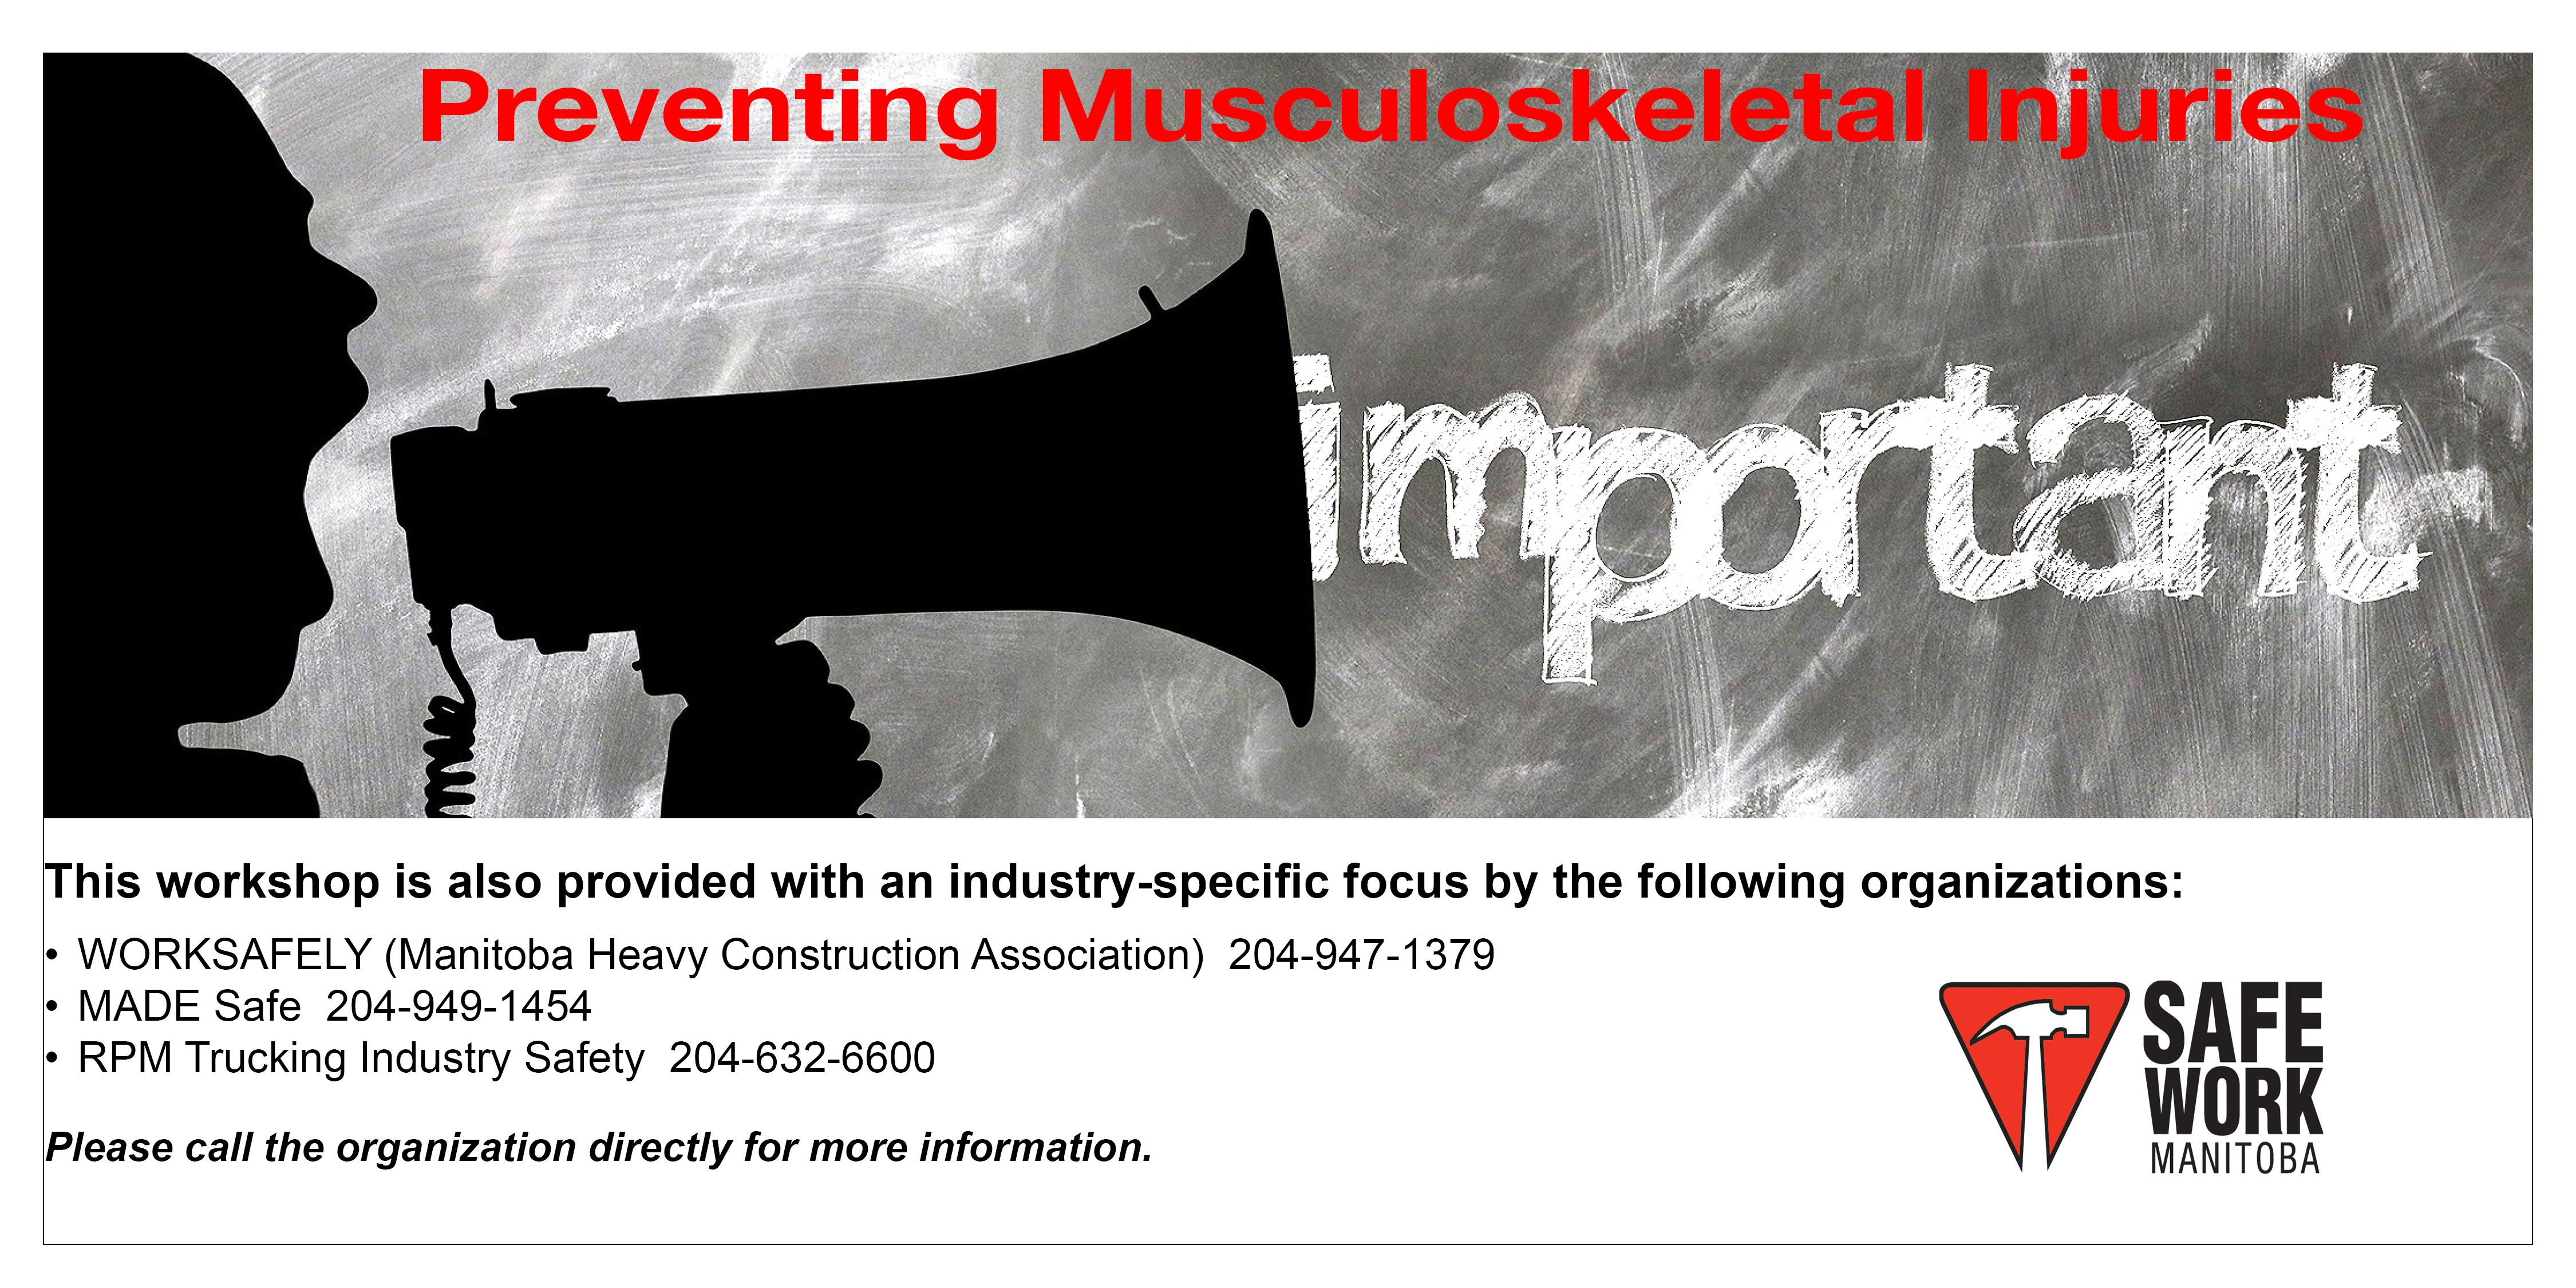 Preventing Musculoskeletal Injuries - Winnipeg, MB